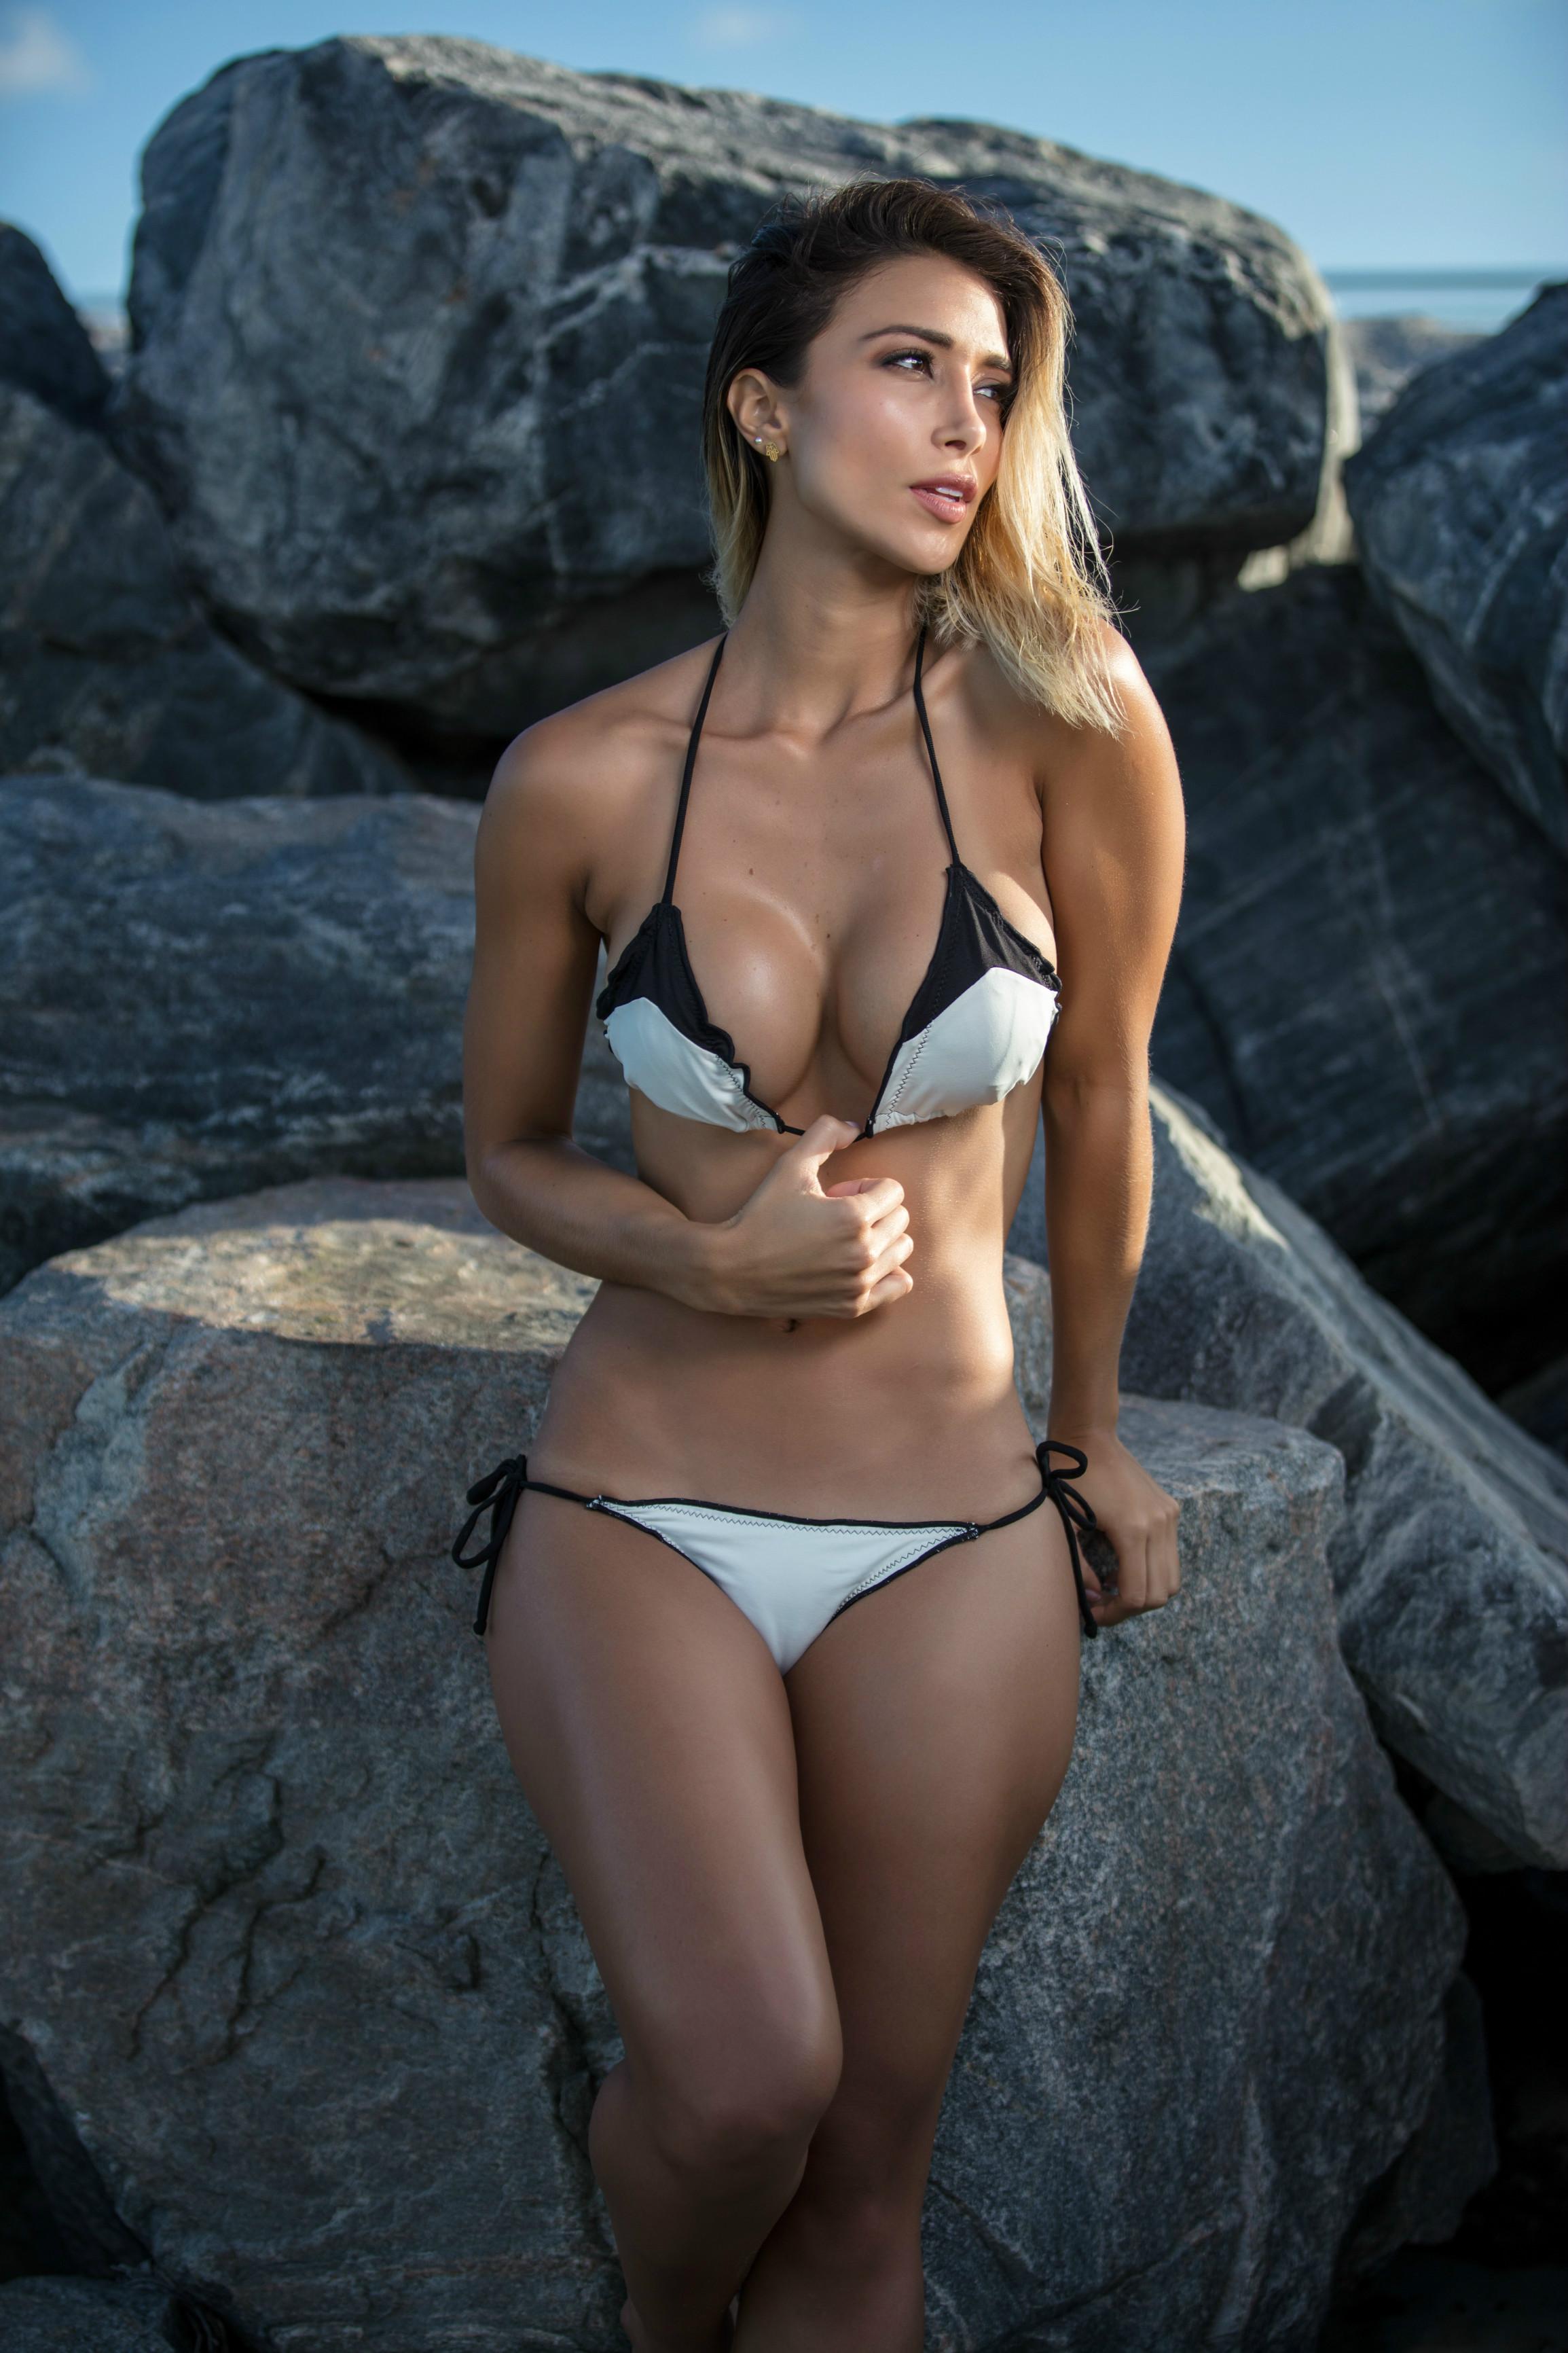 Bikini Valeria Moreno naked (45 photos), Topless, Leaked, Selfie, braless 2006